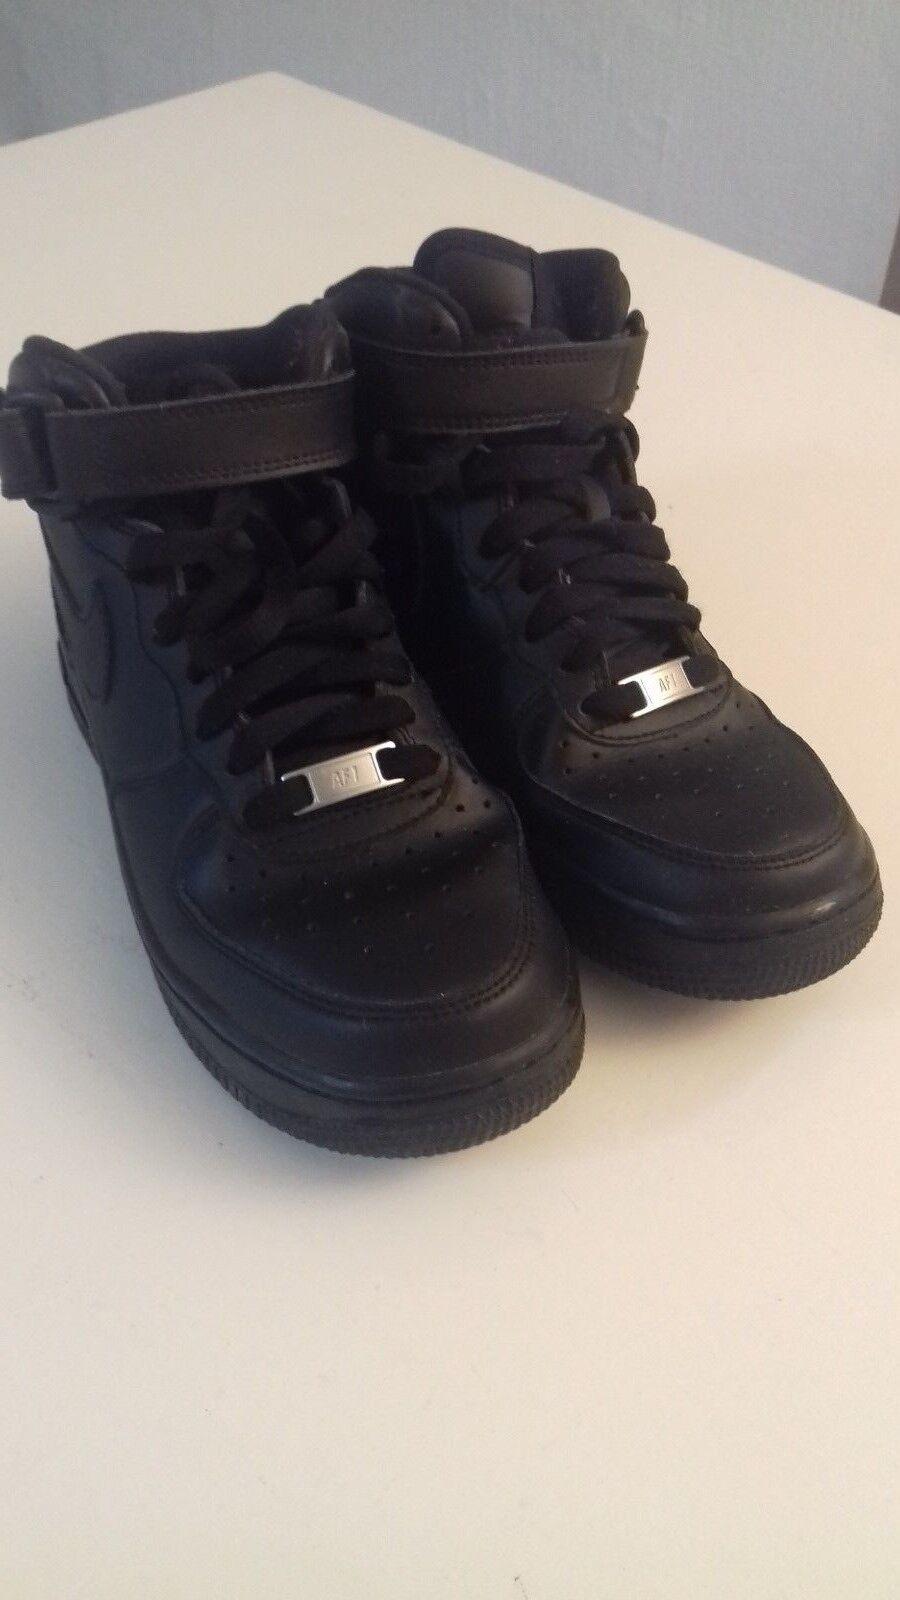 Schuhe Nike Air Force 1 mid Größe 37,5